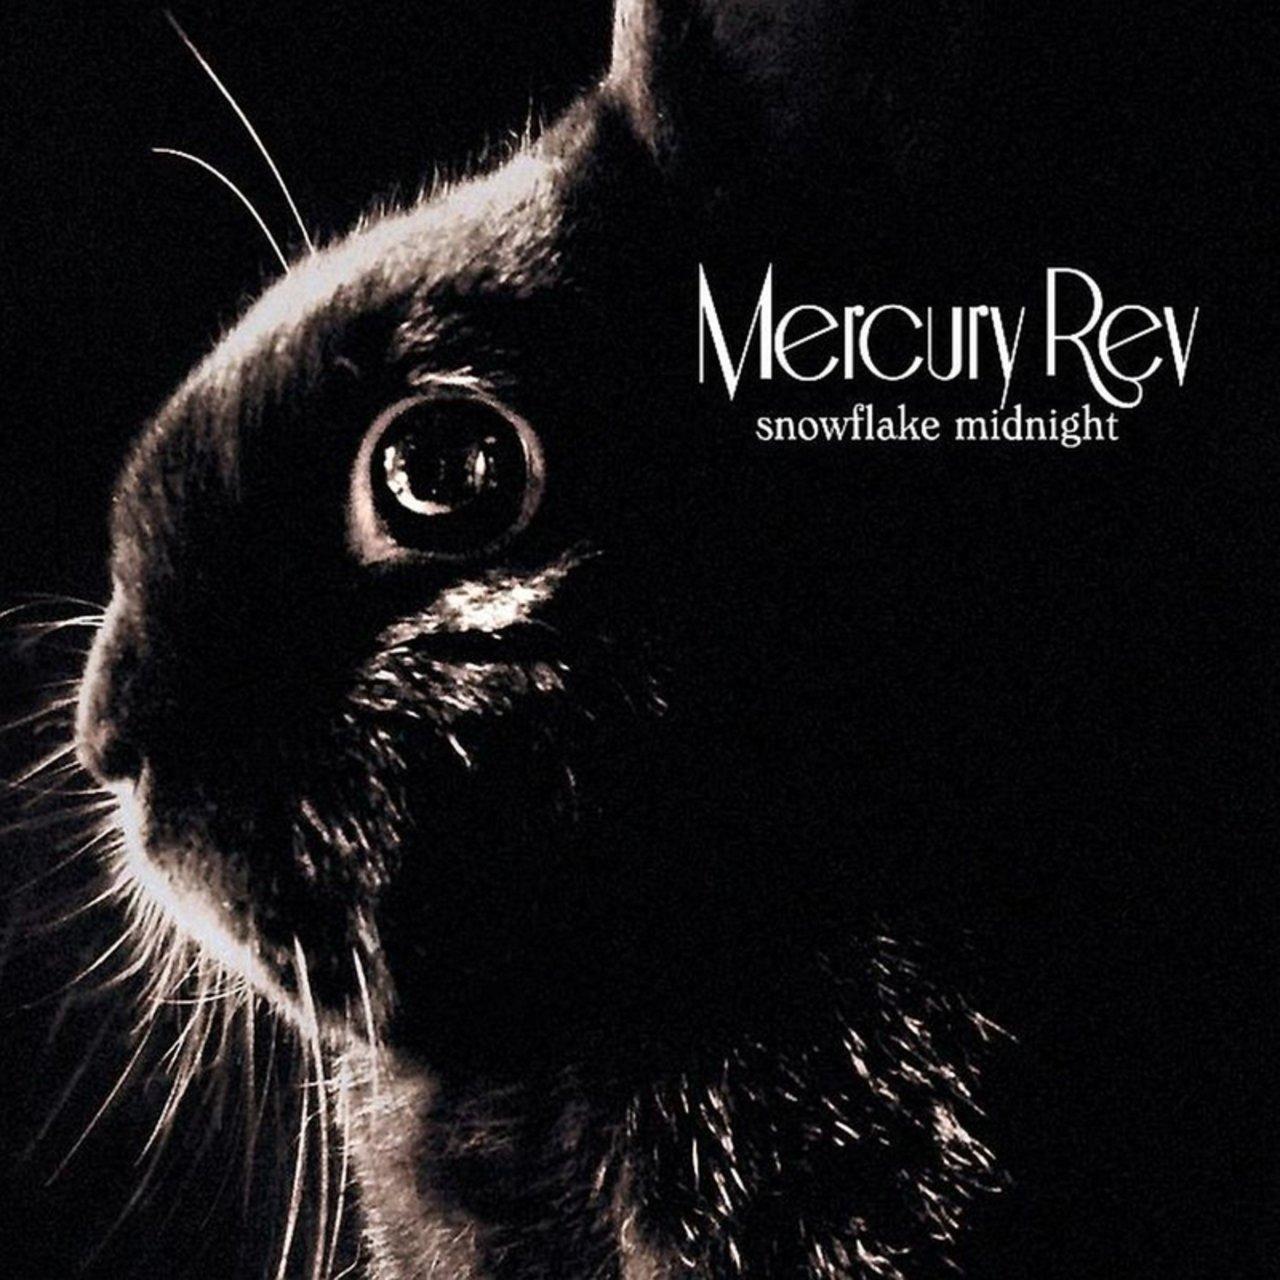 Mercury Rev: Snowflake Midnight - ©2008 Mercury Rev's 7th full-length studio album, originally released in the UK/Europe on V2 Records/Cooperative Music and in the US via Yep Roc.